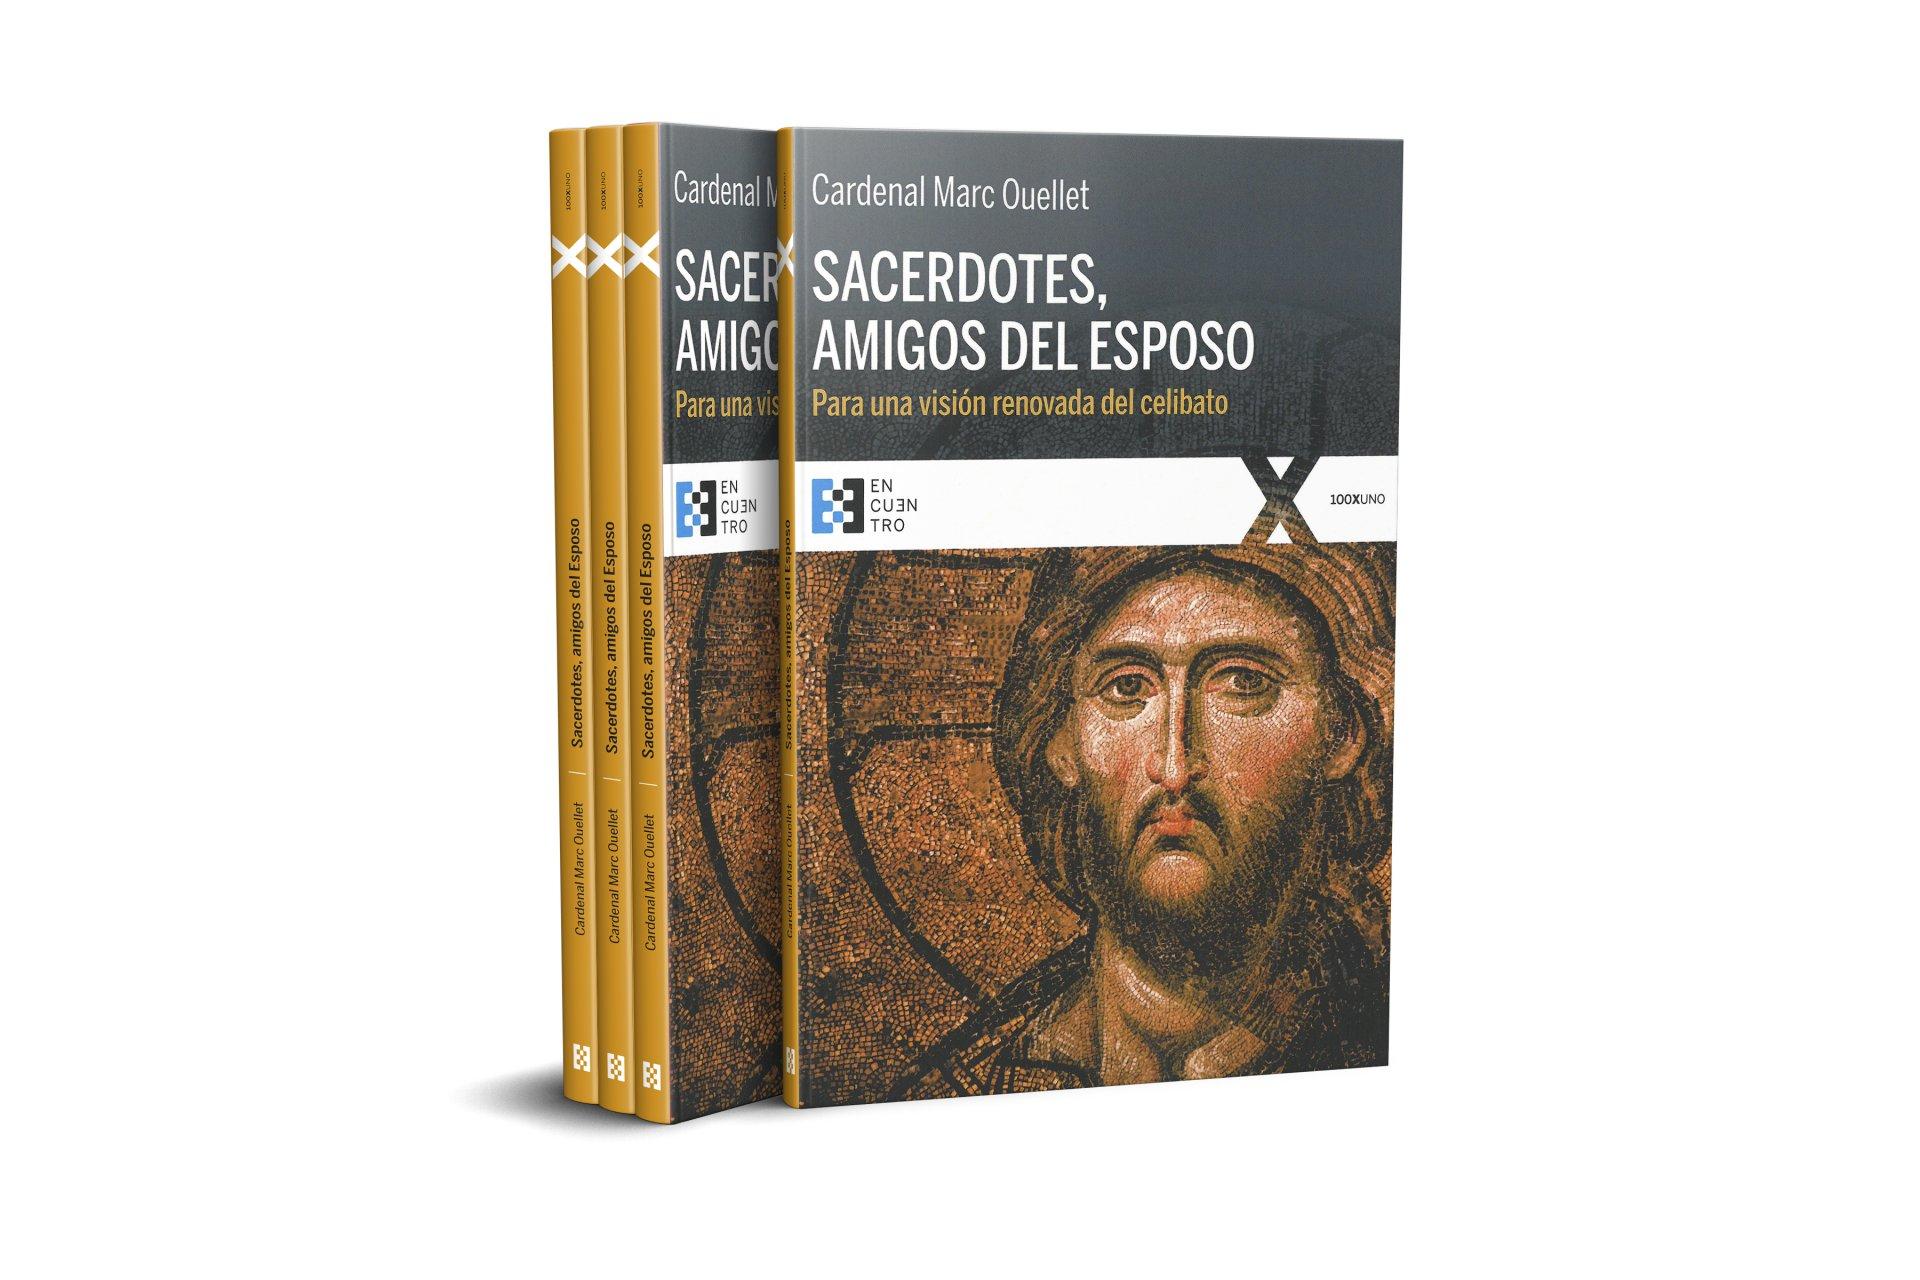 060-6x9-Book-Boxset-Small-Spine-Mockup-COVERVAULT + SACERDOTES.jpg